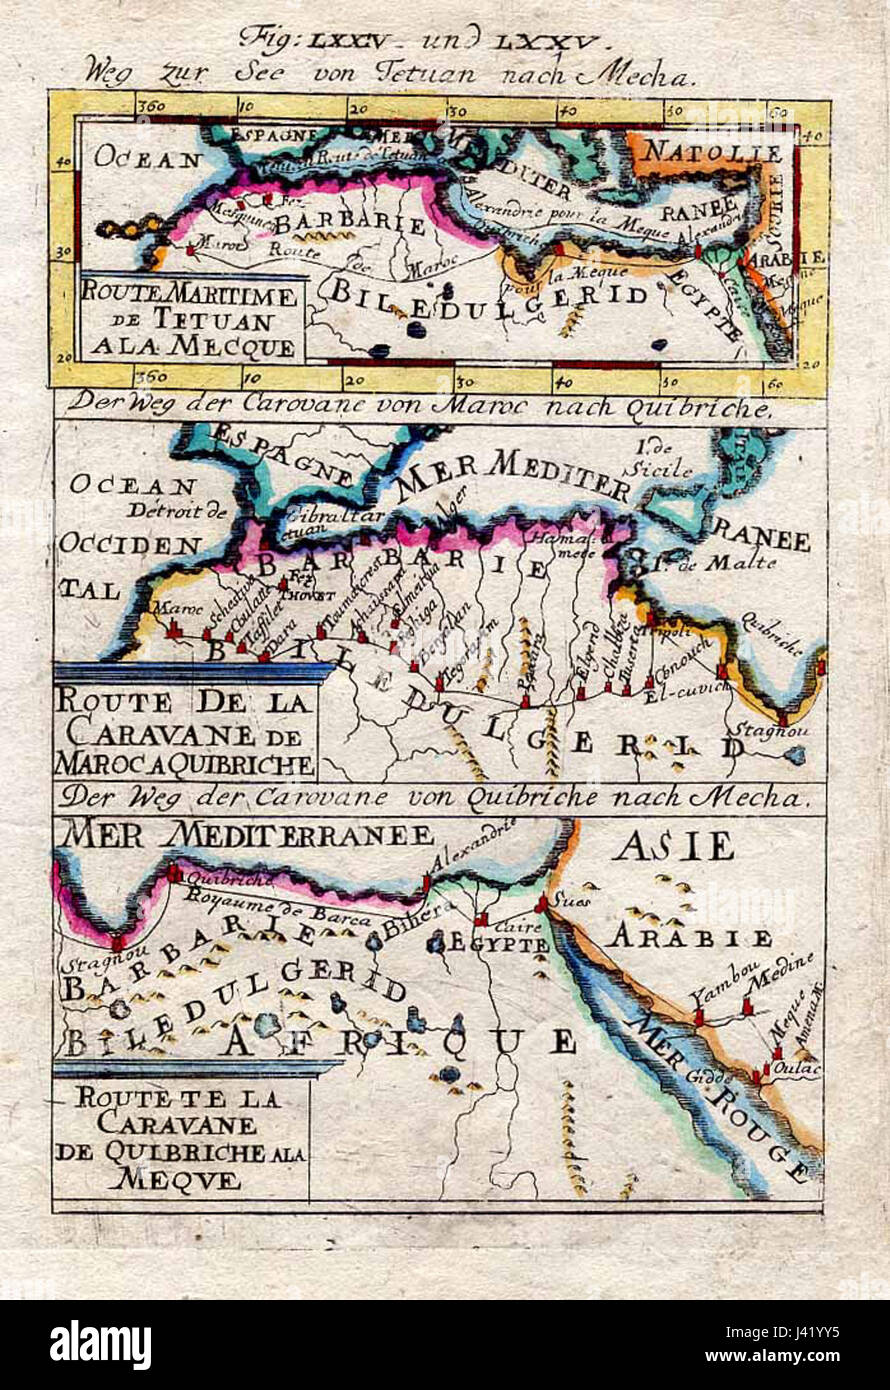 Map Route Mecca on mesopotamia map, middle east map, world map, damascus on map, iraq map, medina map, israel map, makkah map, strait of hormuz map, sinai peninsula map, jerusalem map, persian gulf map, red sea map, aden map, india map, japan map, mediterranean sea map, baghdad map, arabian peninsula map, saudi arabia map,